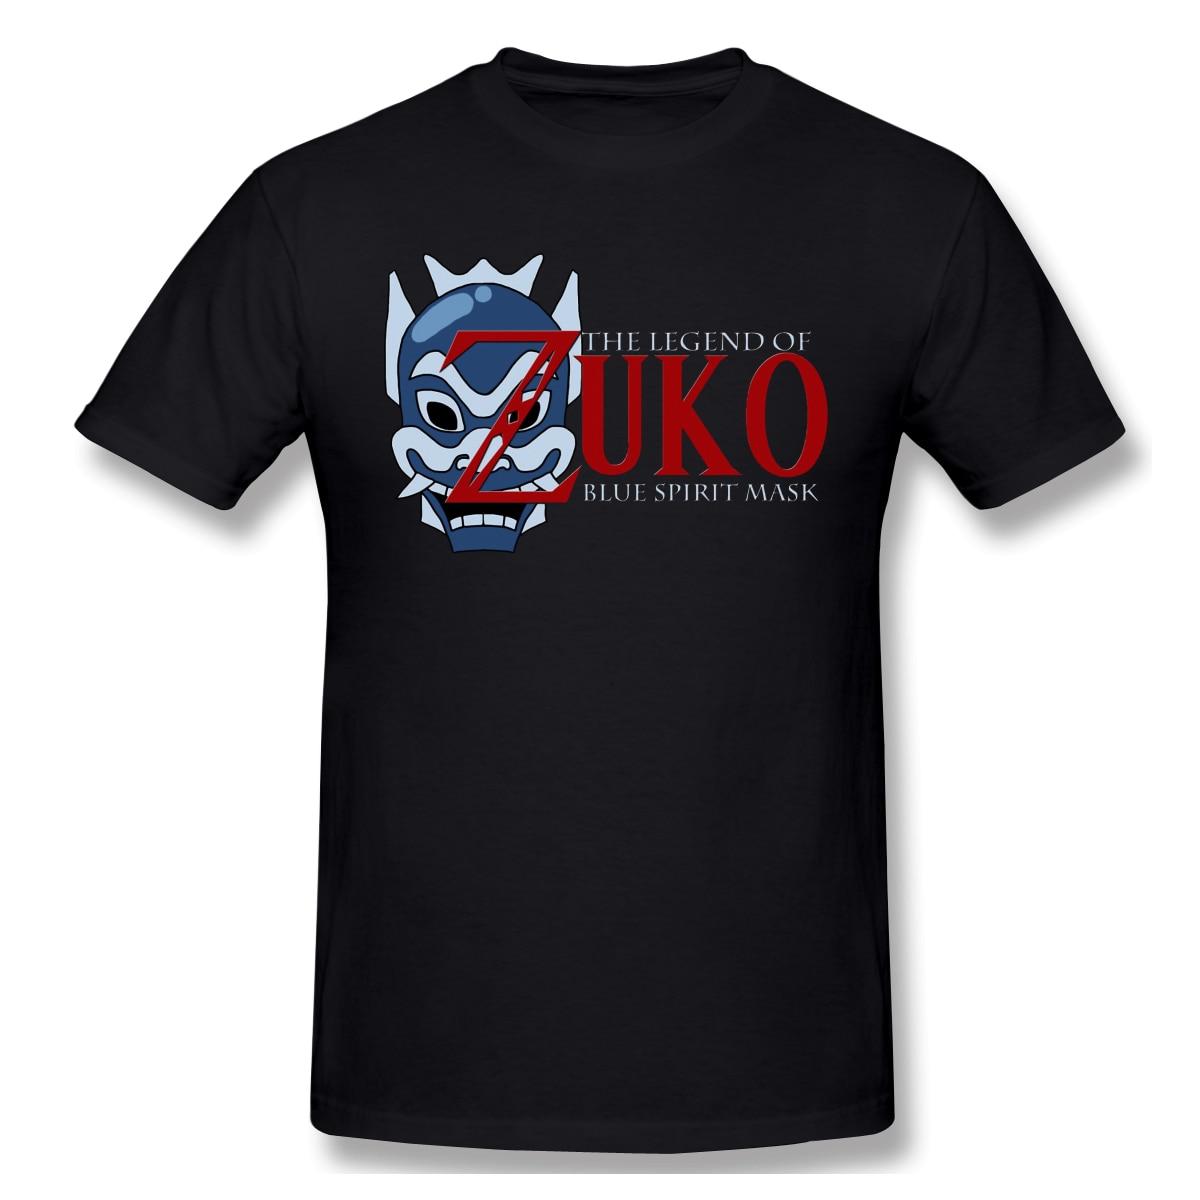 The Legend Of Zuko - Blue Spirit MaskT-Shirt Men Top Quality 100% Cotton Short Summer Sleeve legend of zelda Casual Tshirt Loose